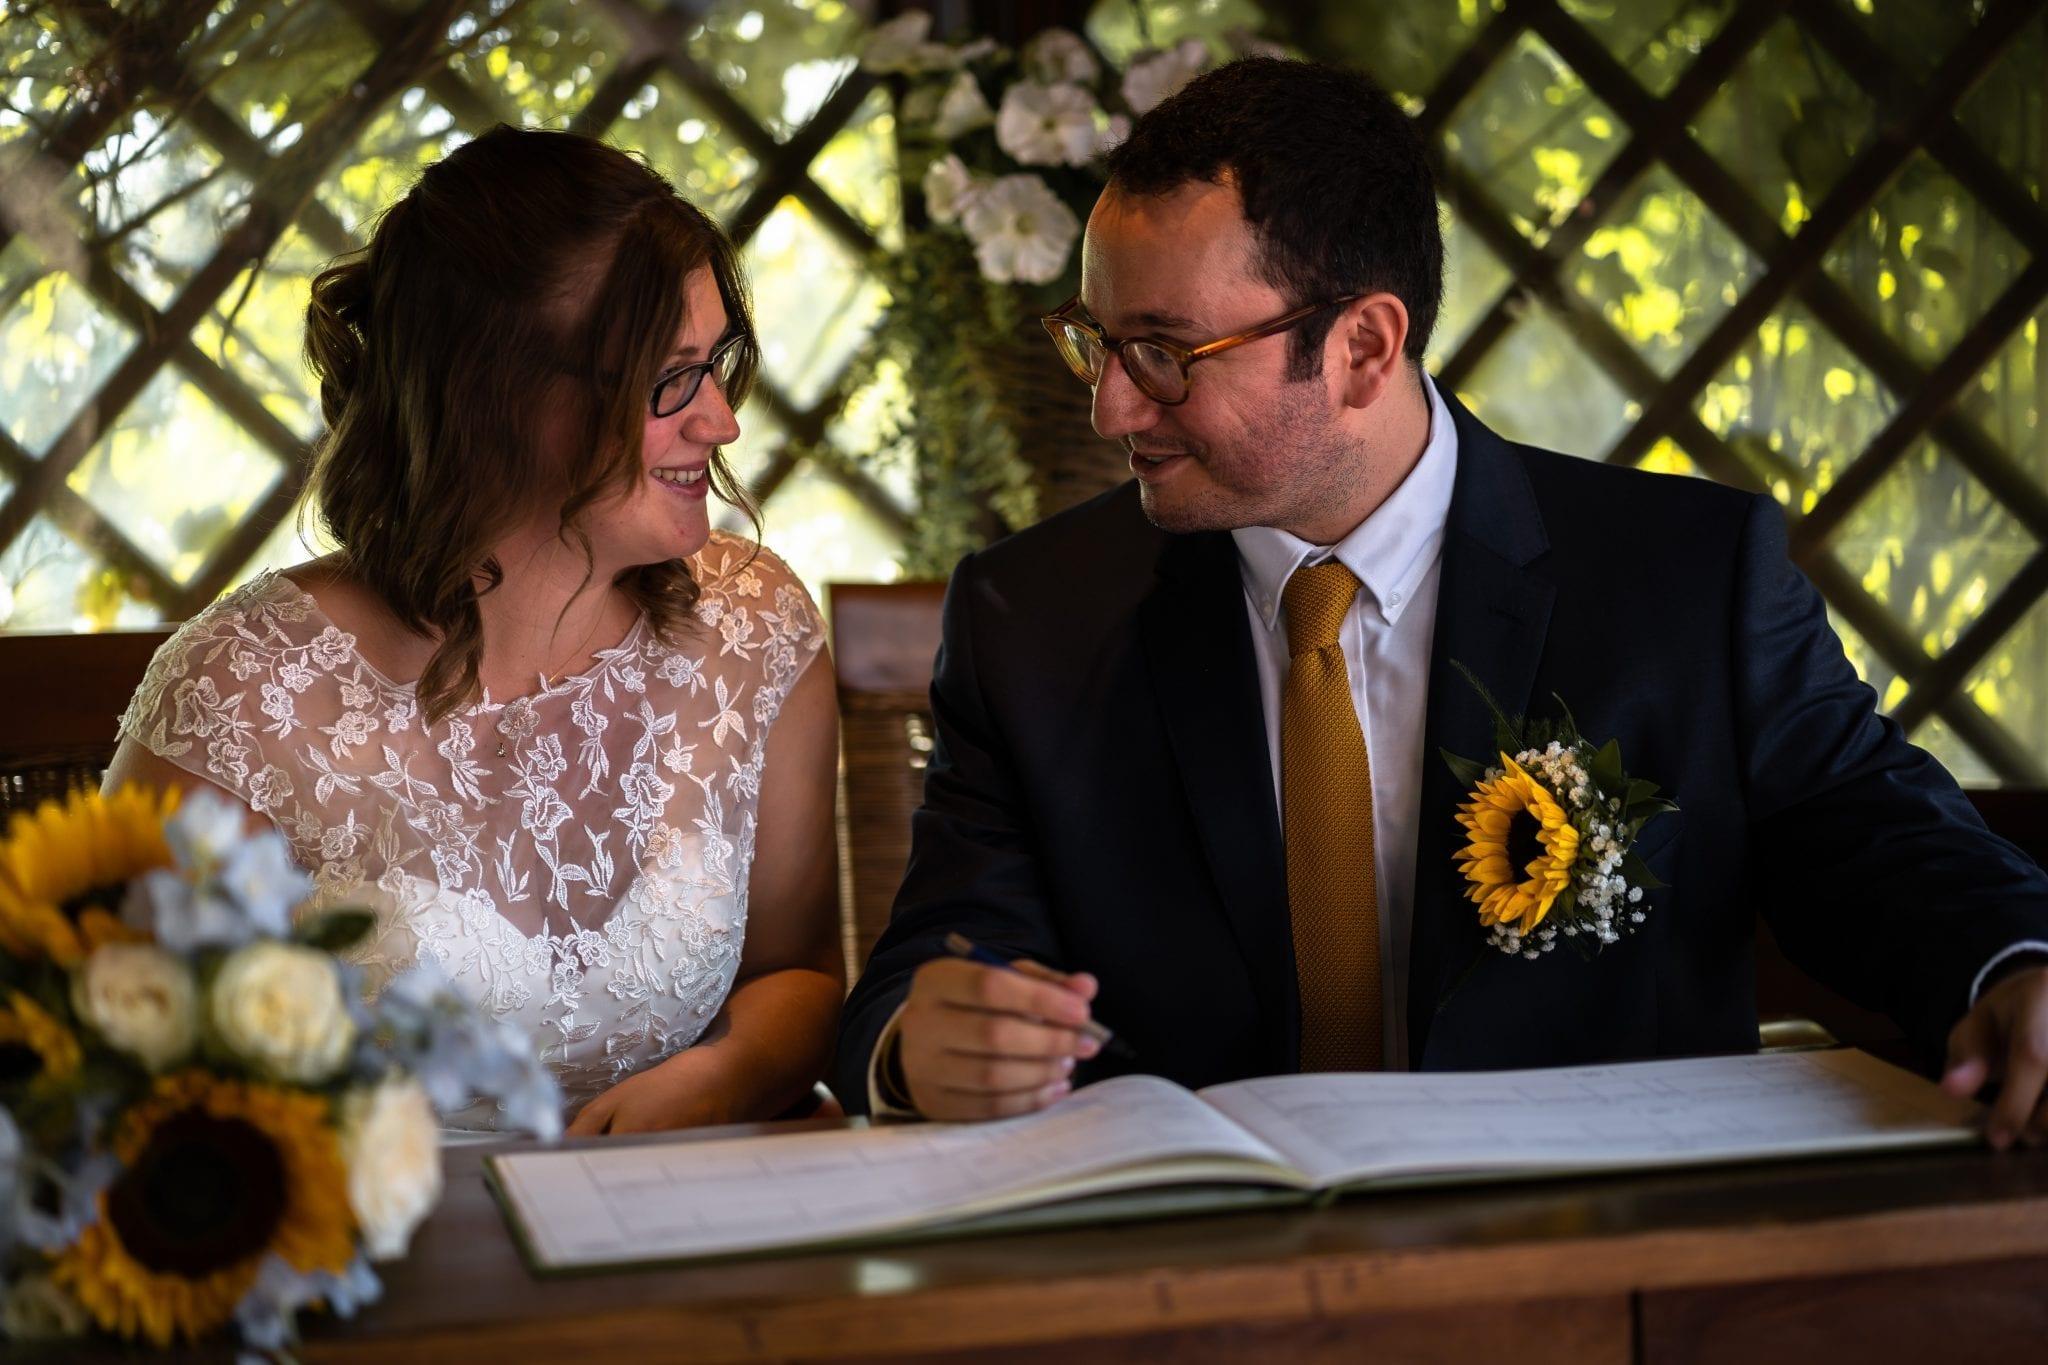 Documentary Wedding Photography - Register Signing